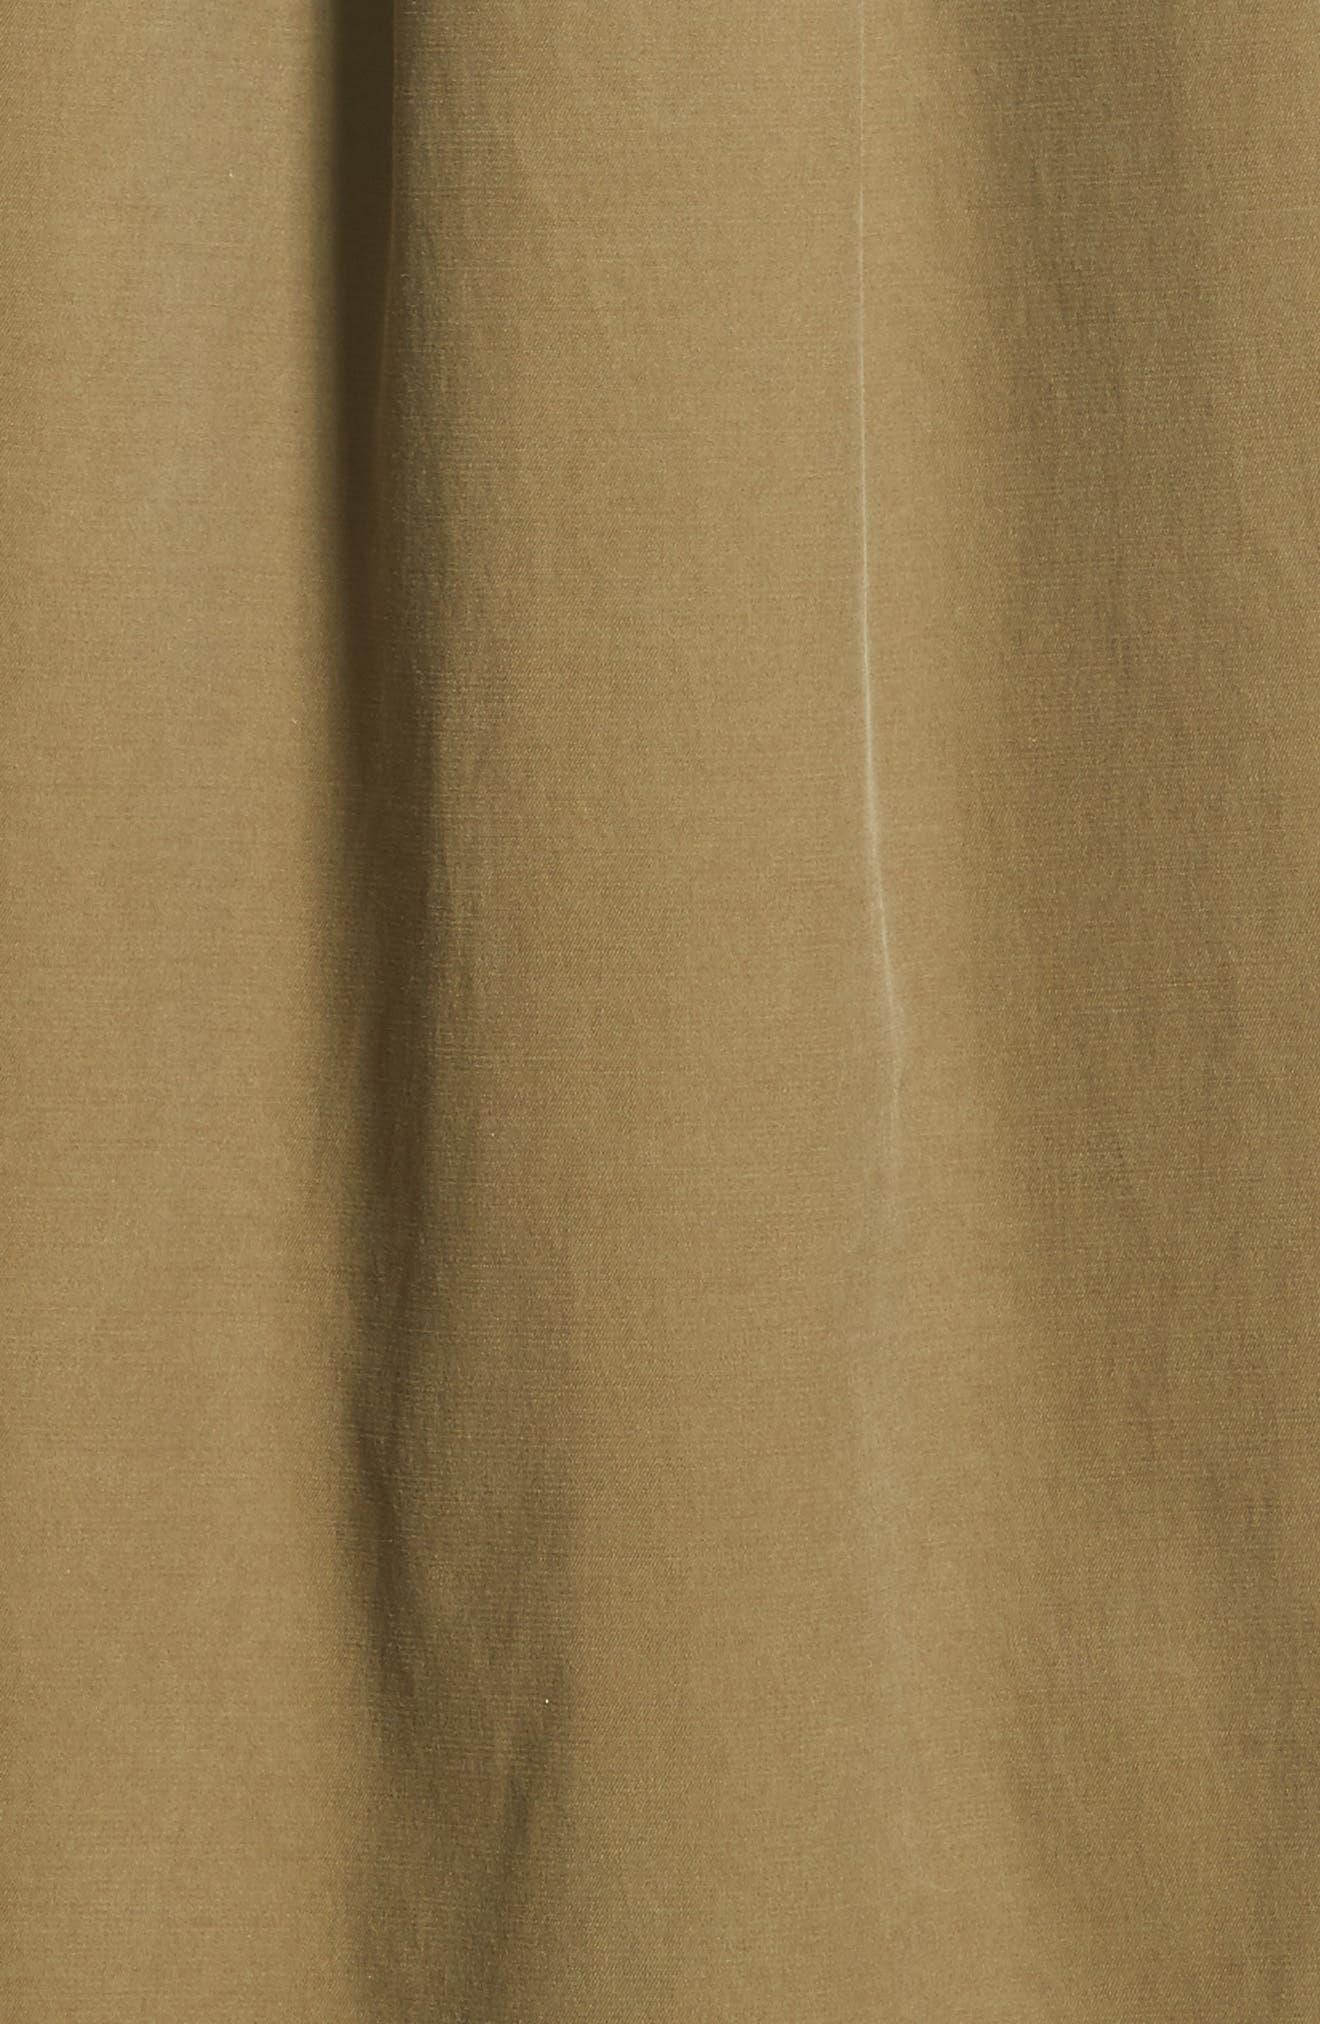 Mason Shirtdress,                             Alternate thumbnail 5, color,                             308